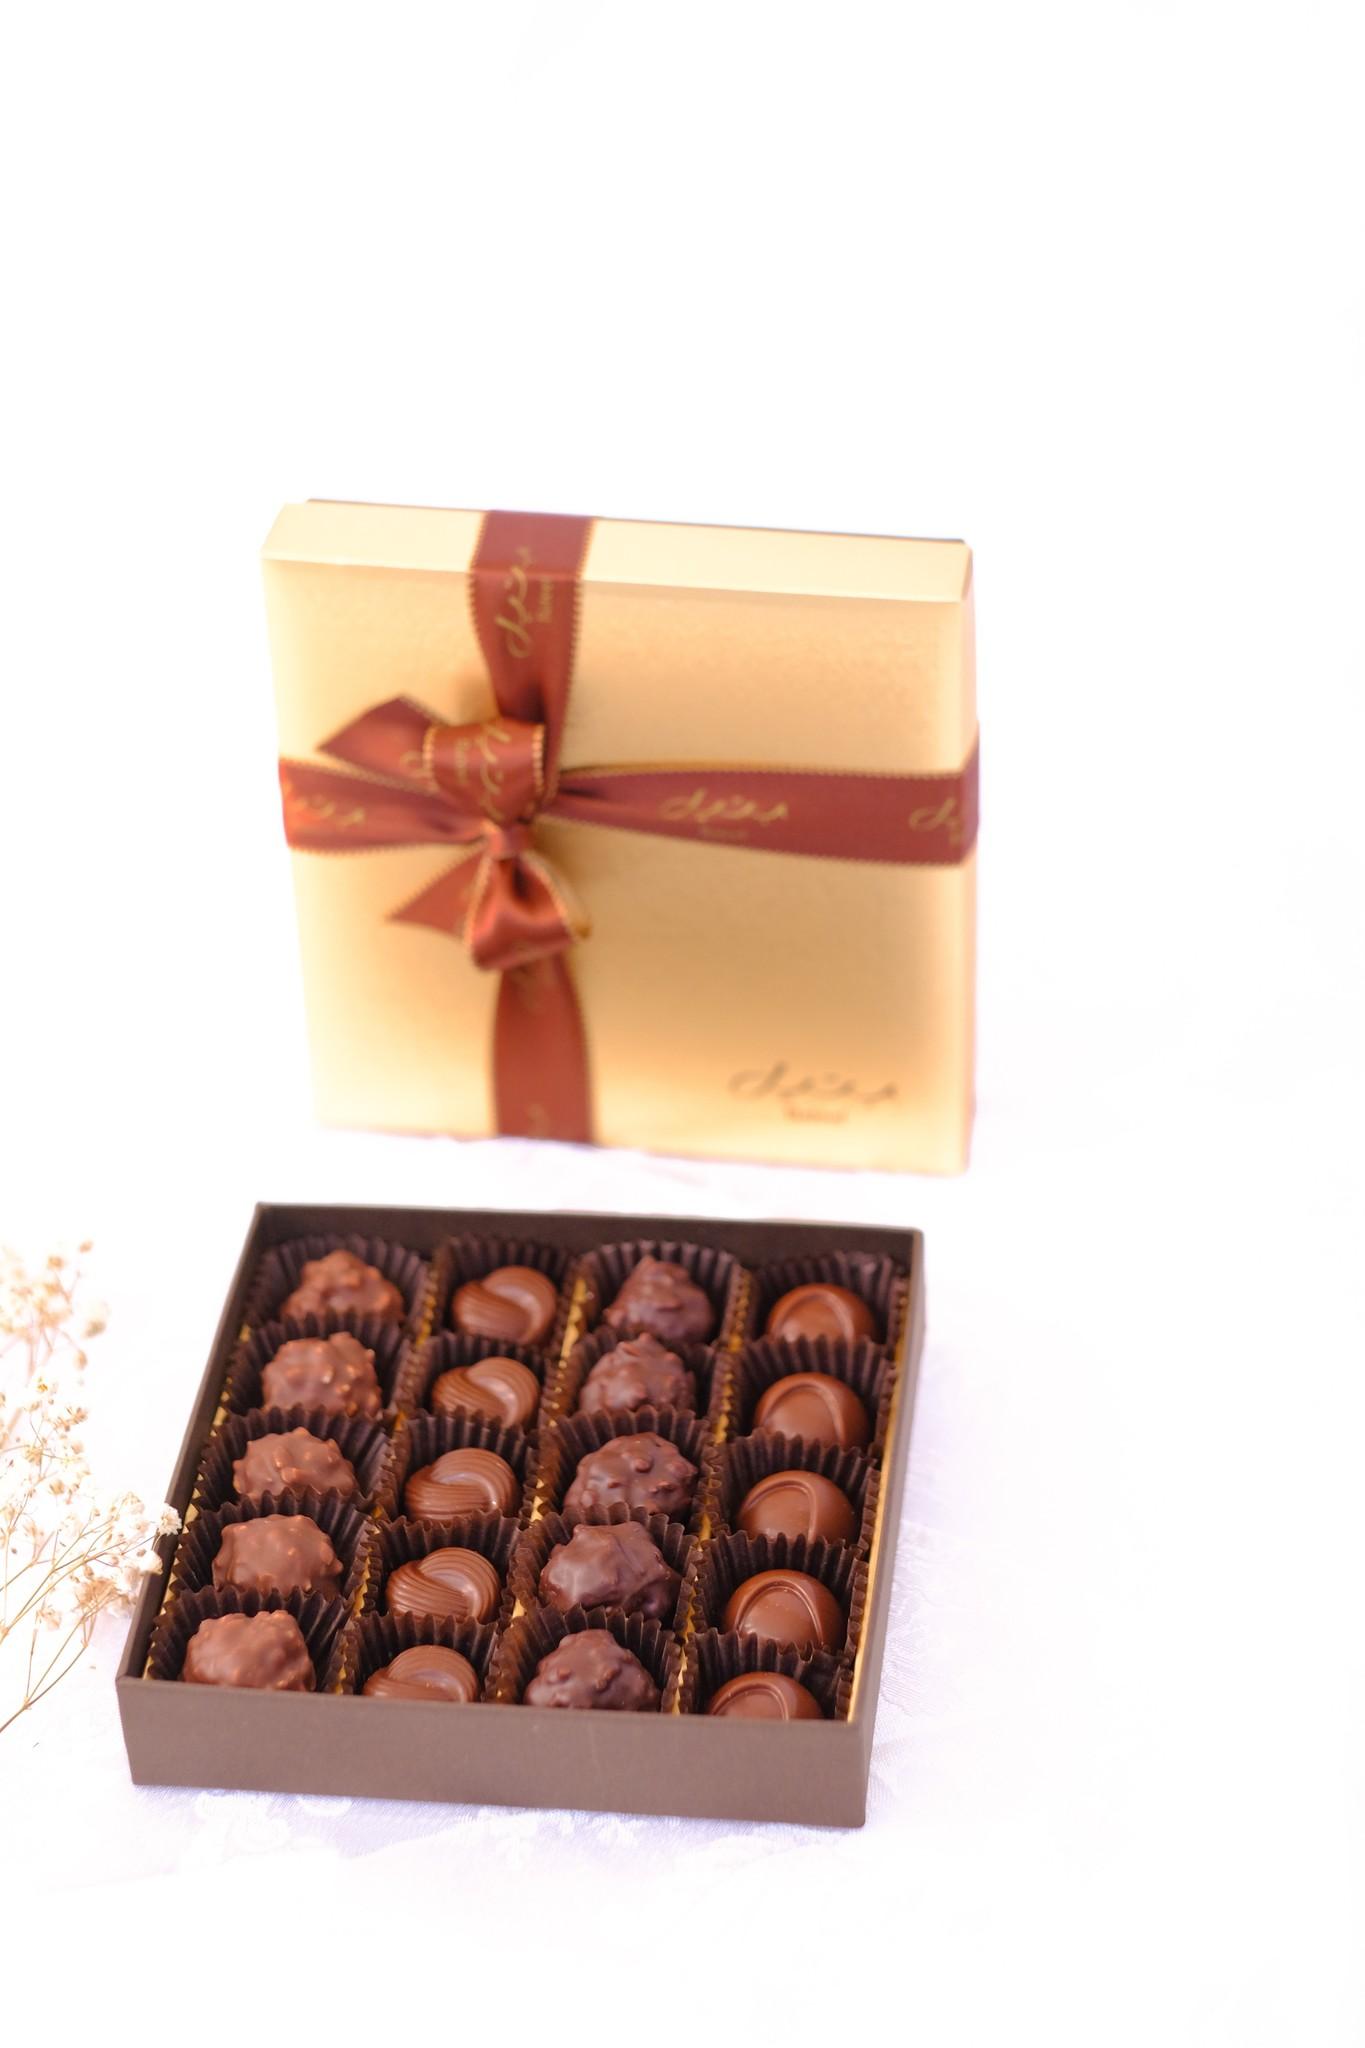 Bateel USA Cassandra S Hazelnut Chocolate Lovers Assortment